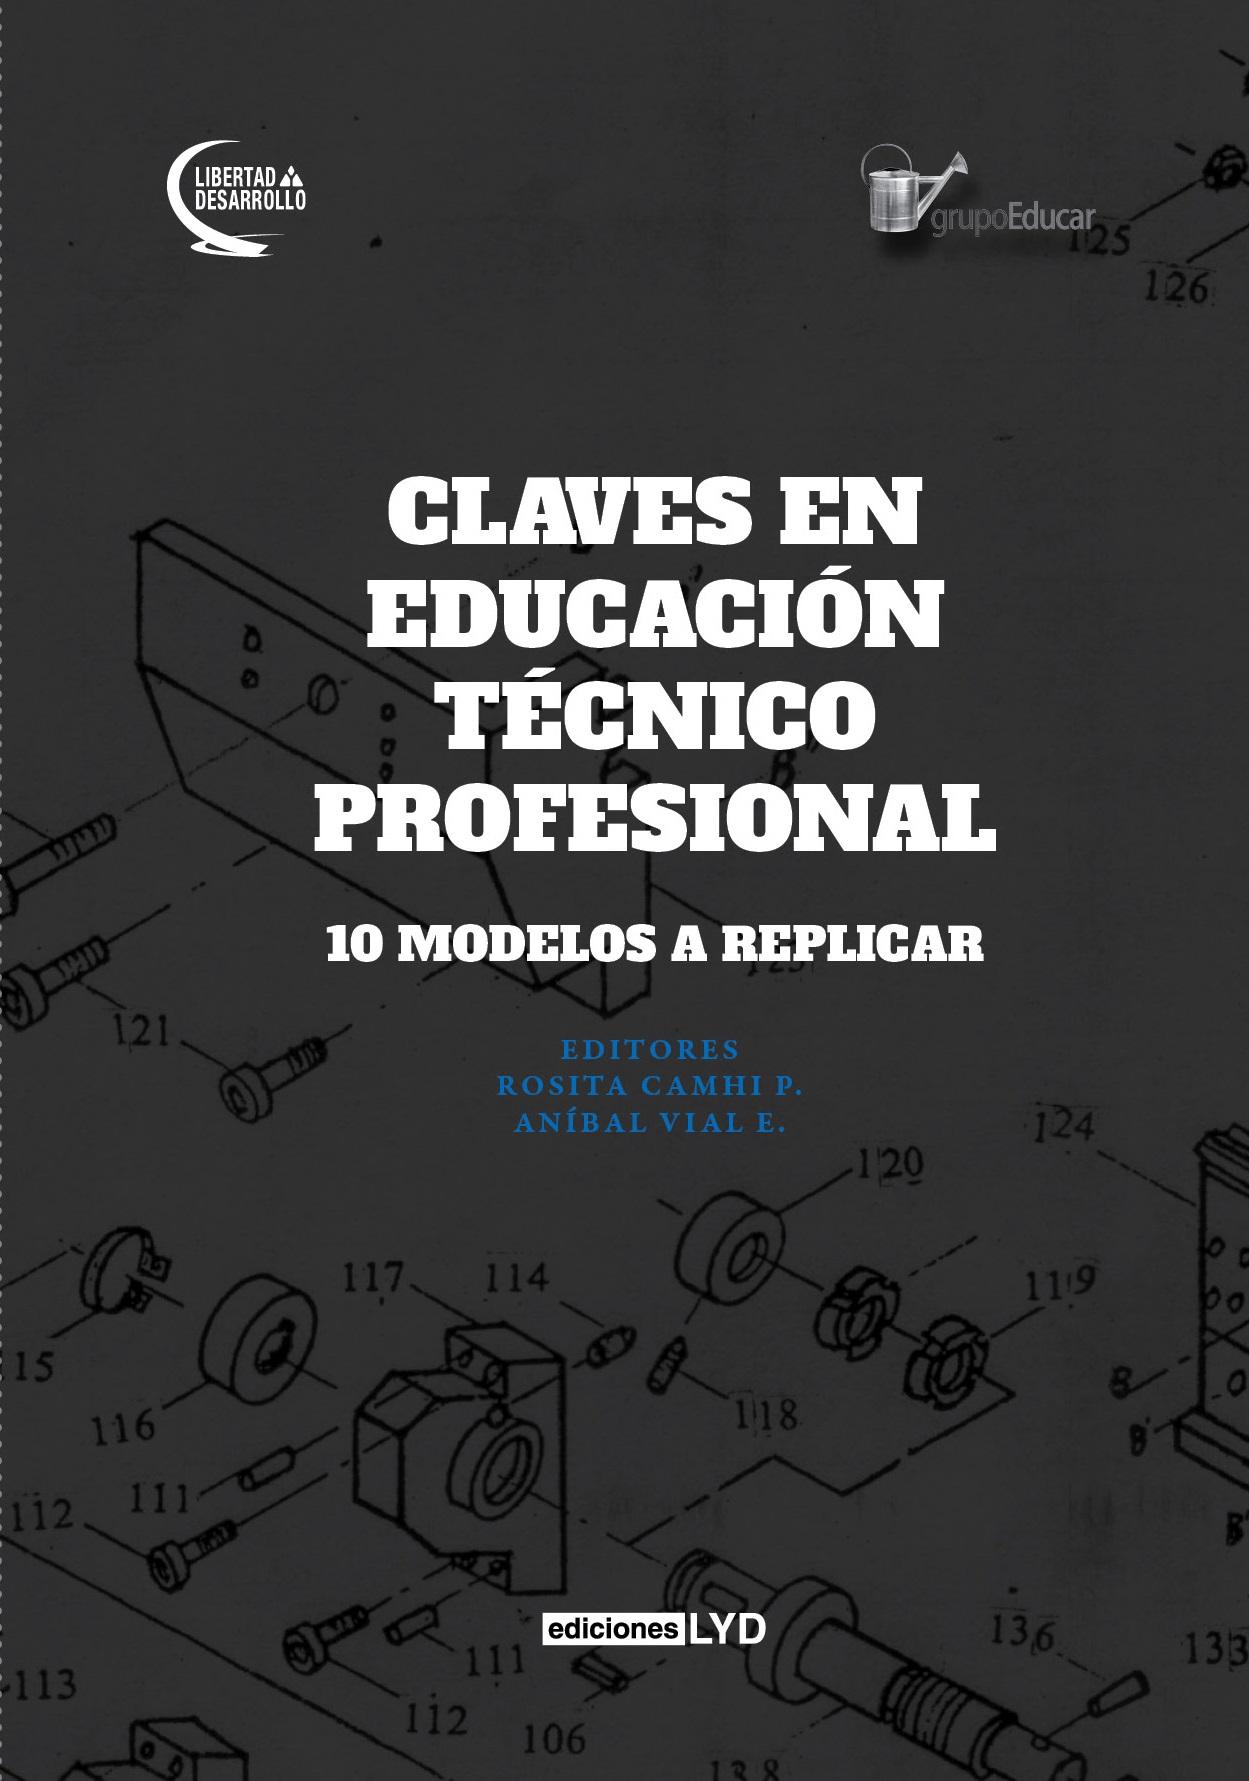 Claves-en-Educacion-Técnico-Profesional-1